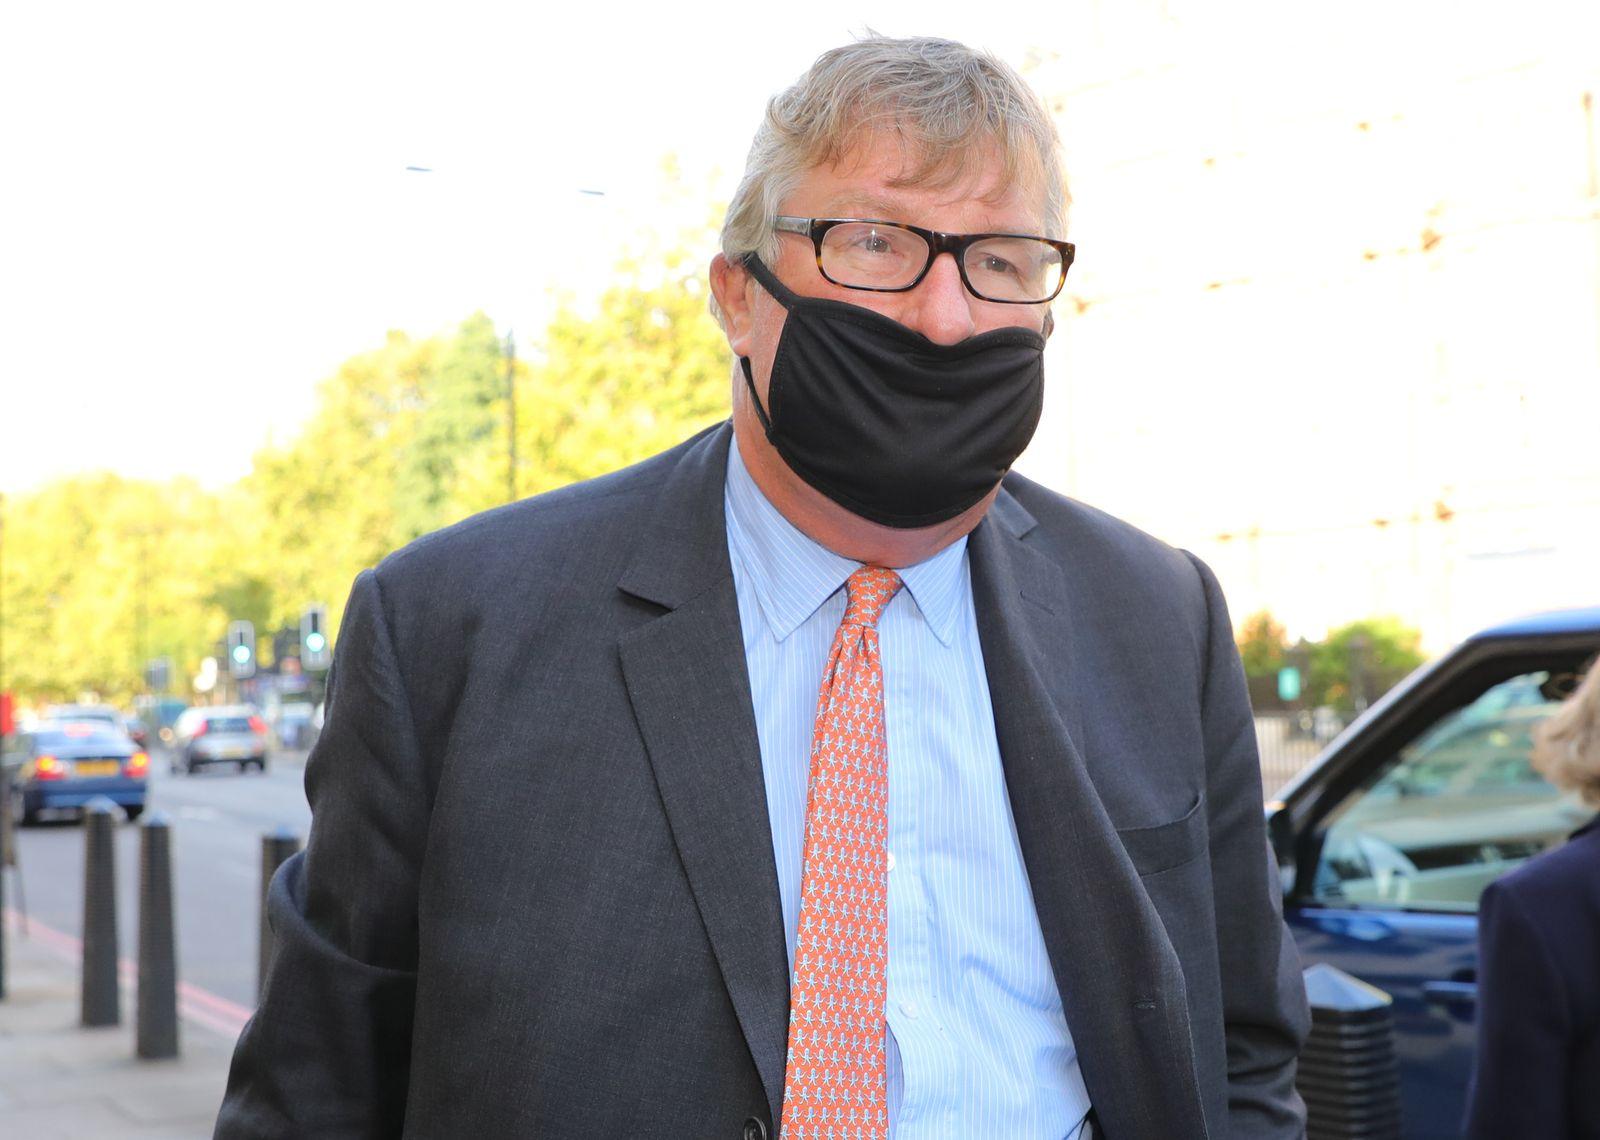 Crispin Odey court case